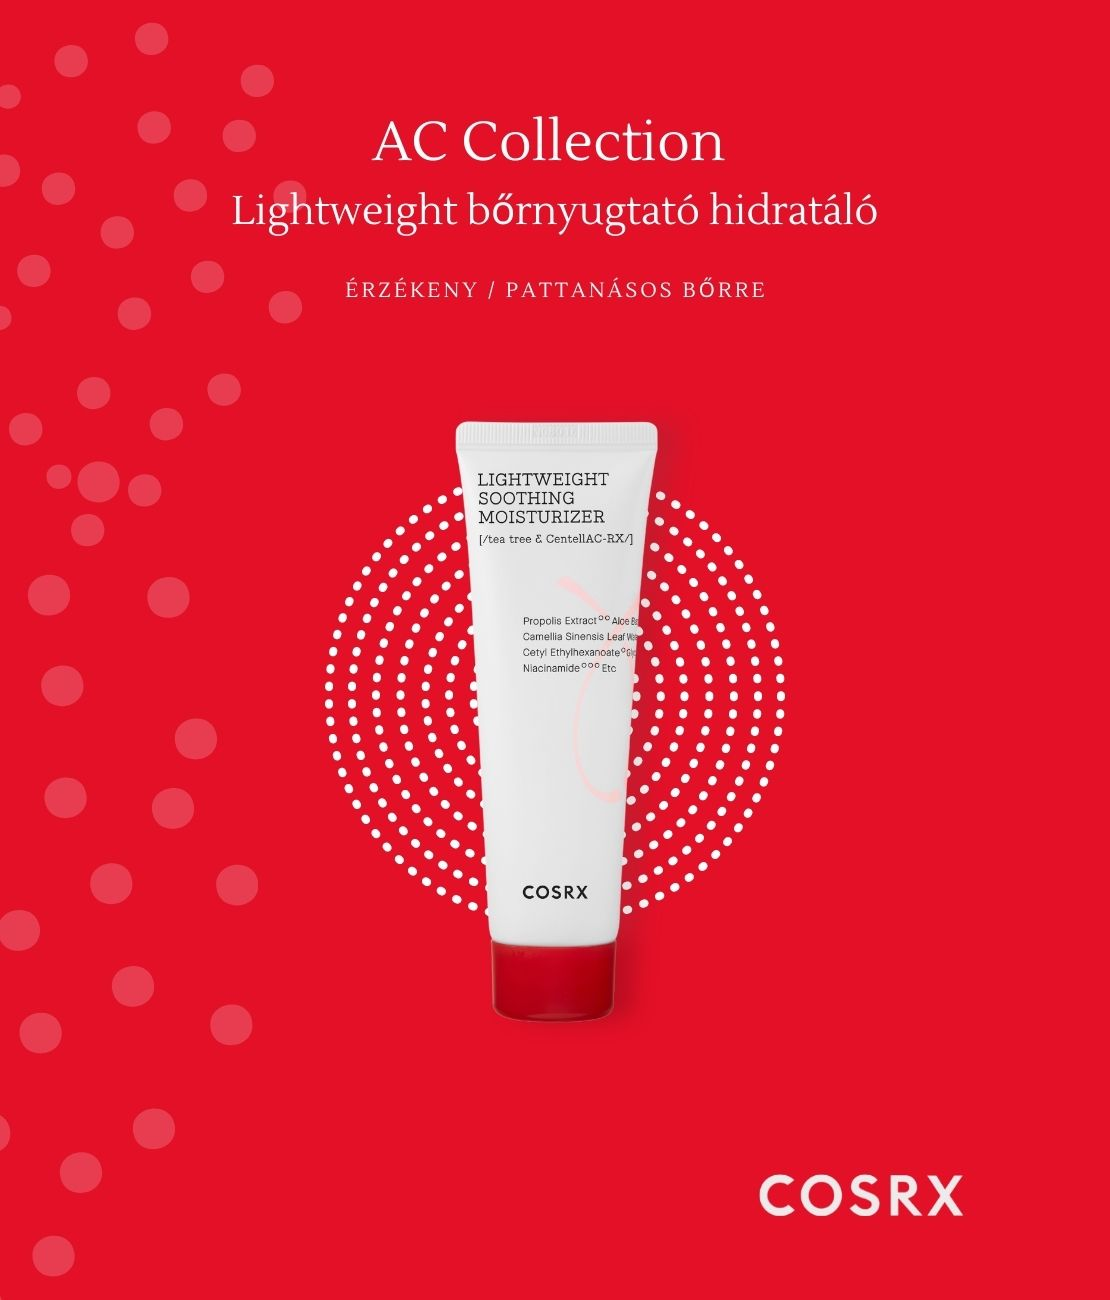 COSRX-AC-Collection-lightweight-bornyugtato-hidratalo-leiras